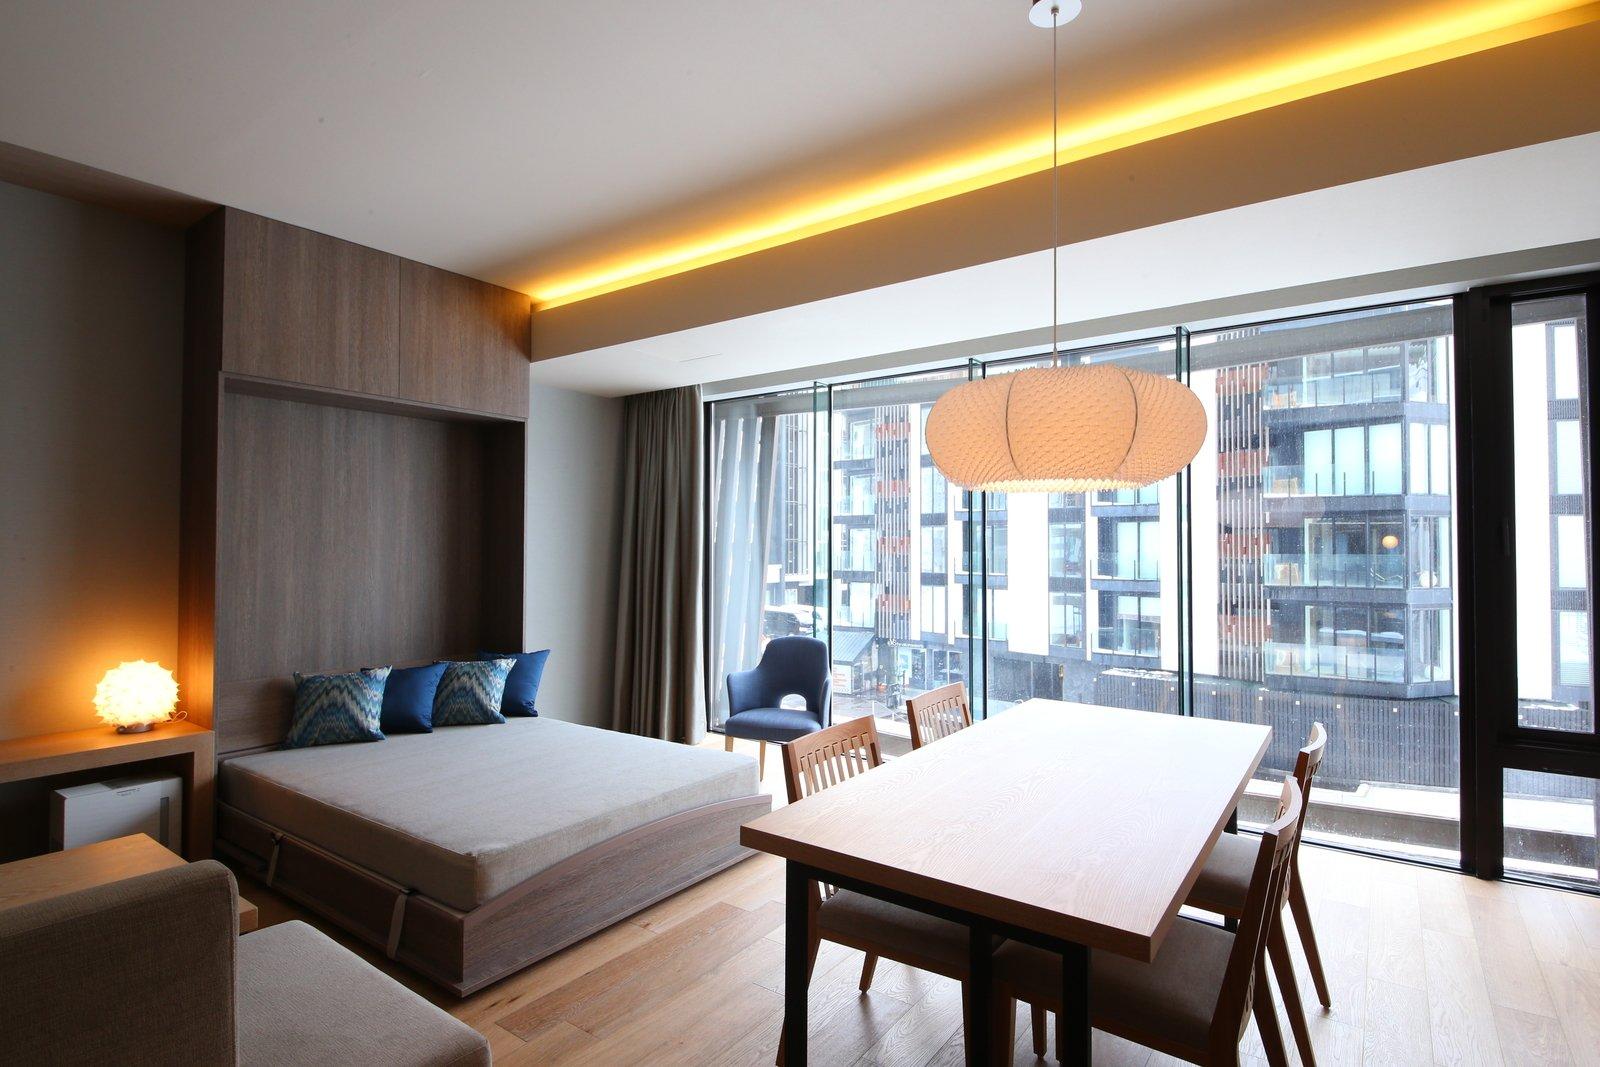 1 5 bedroom 2 large